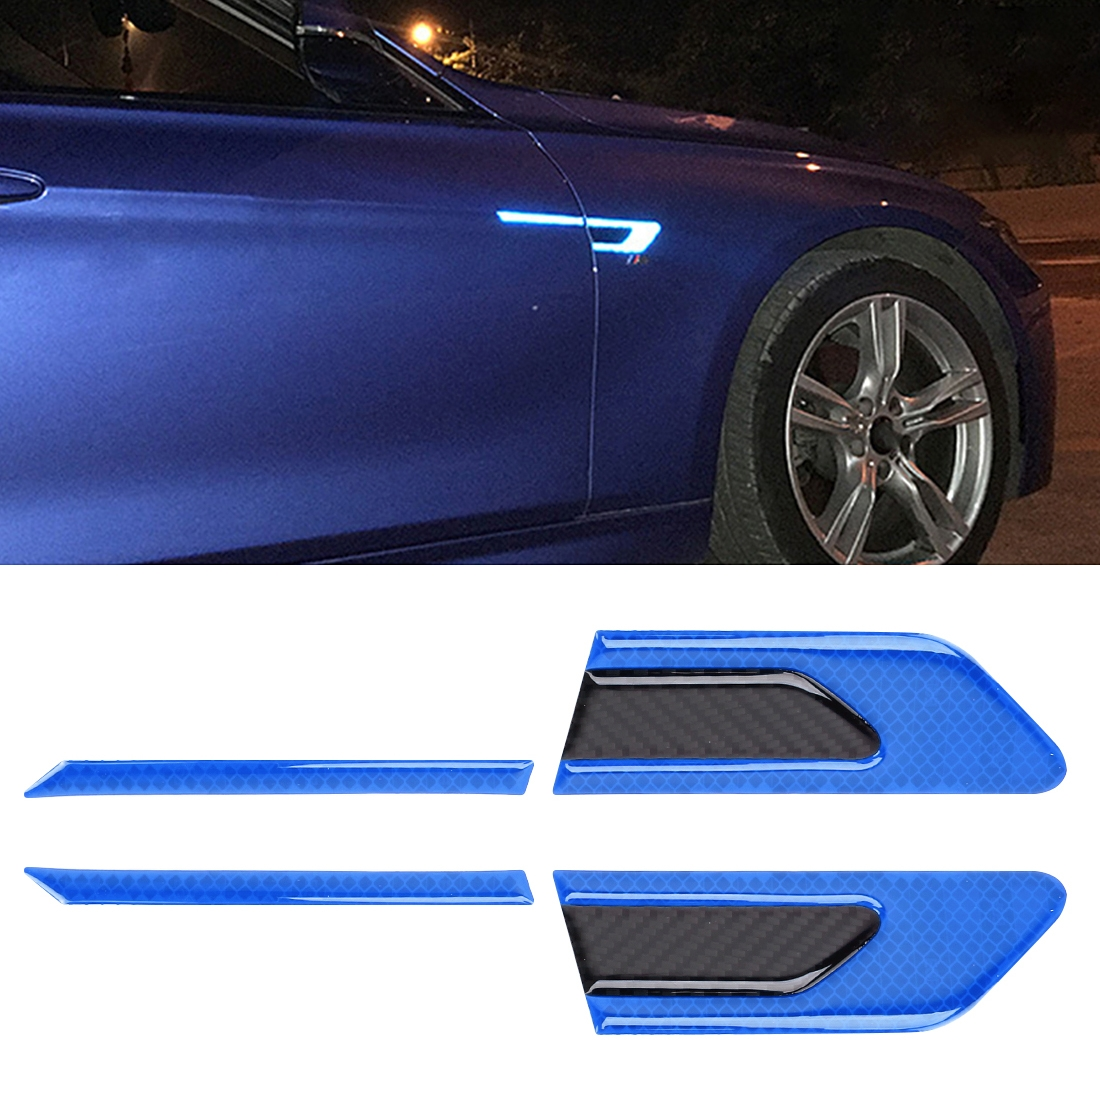 2 PCS Carbon Fiber Car-Styling Fender Reflective Bumper Decorative Strip, External Reflection + Inner Carbon Fiber (Blue)